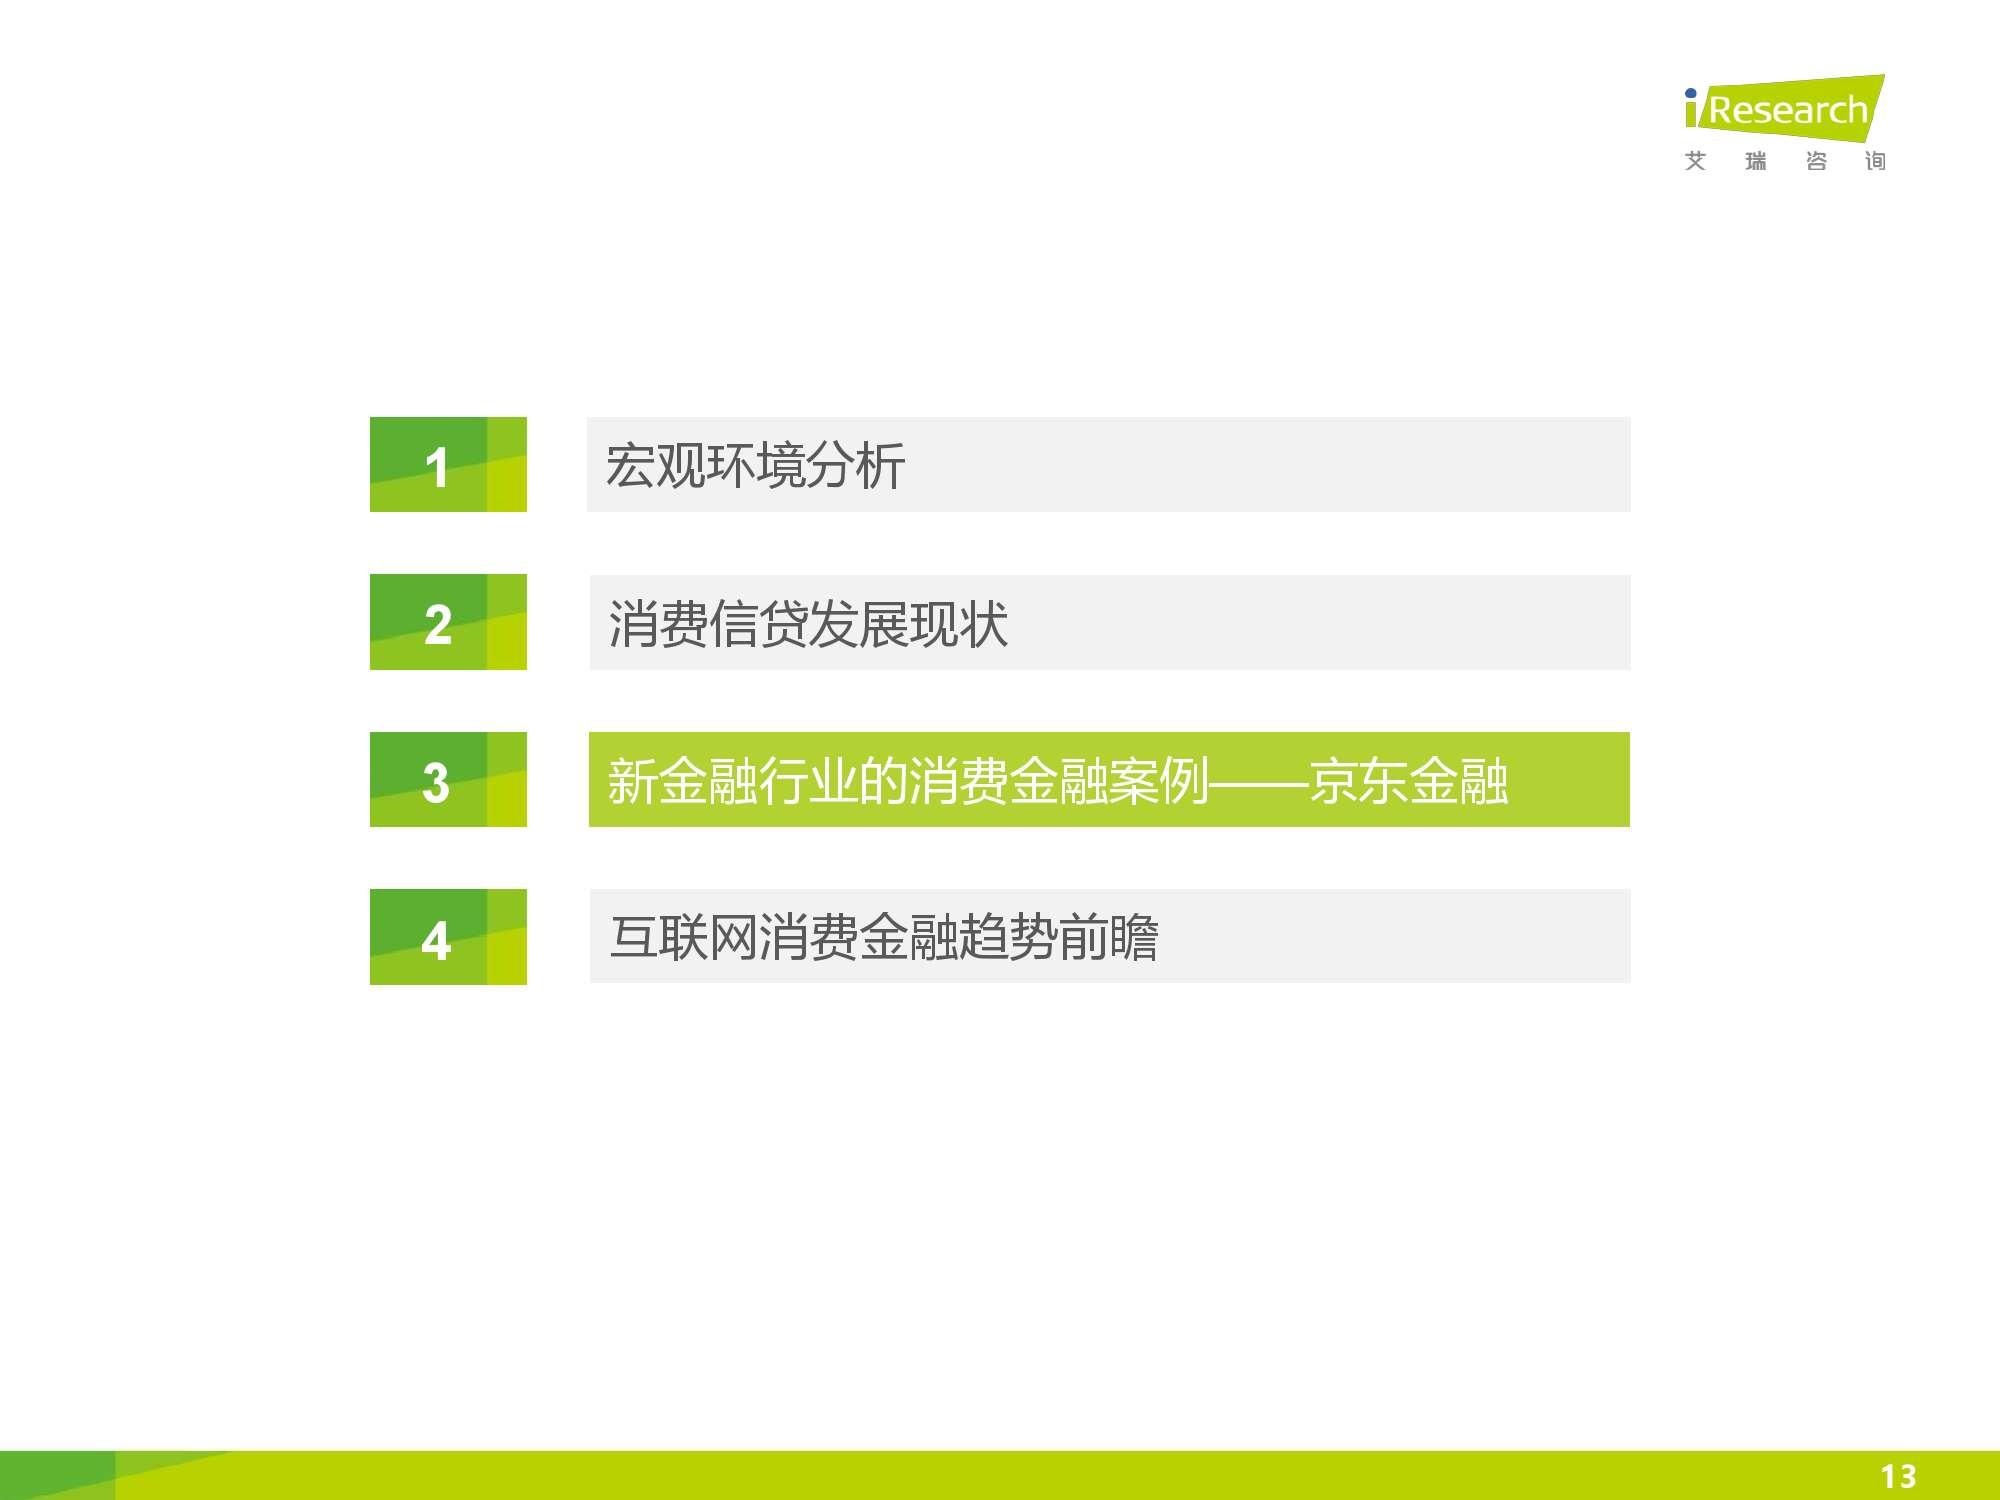 iResearch-2016年中国互联网消费金融市场研究报告_000013